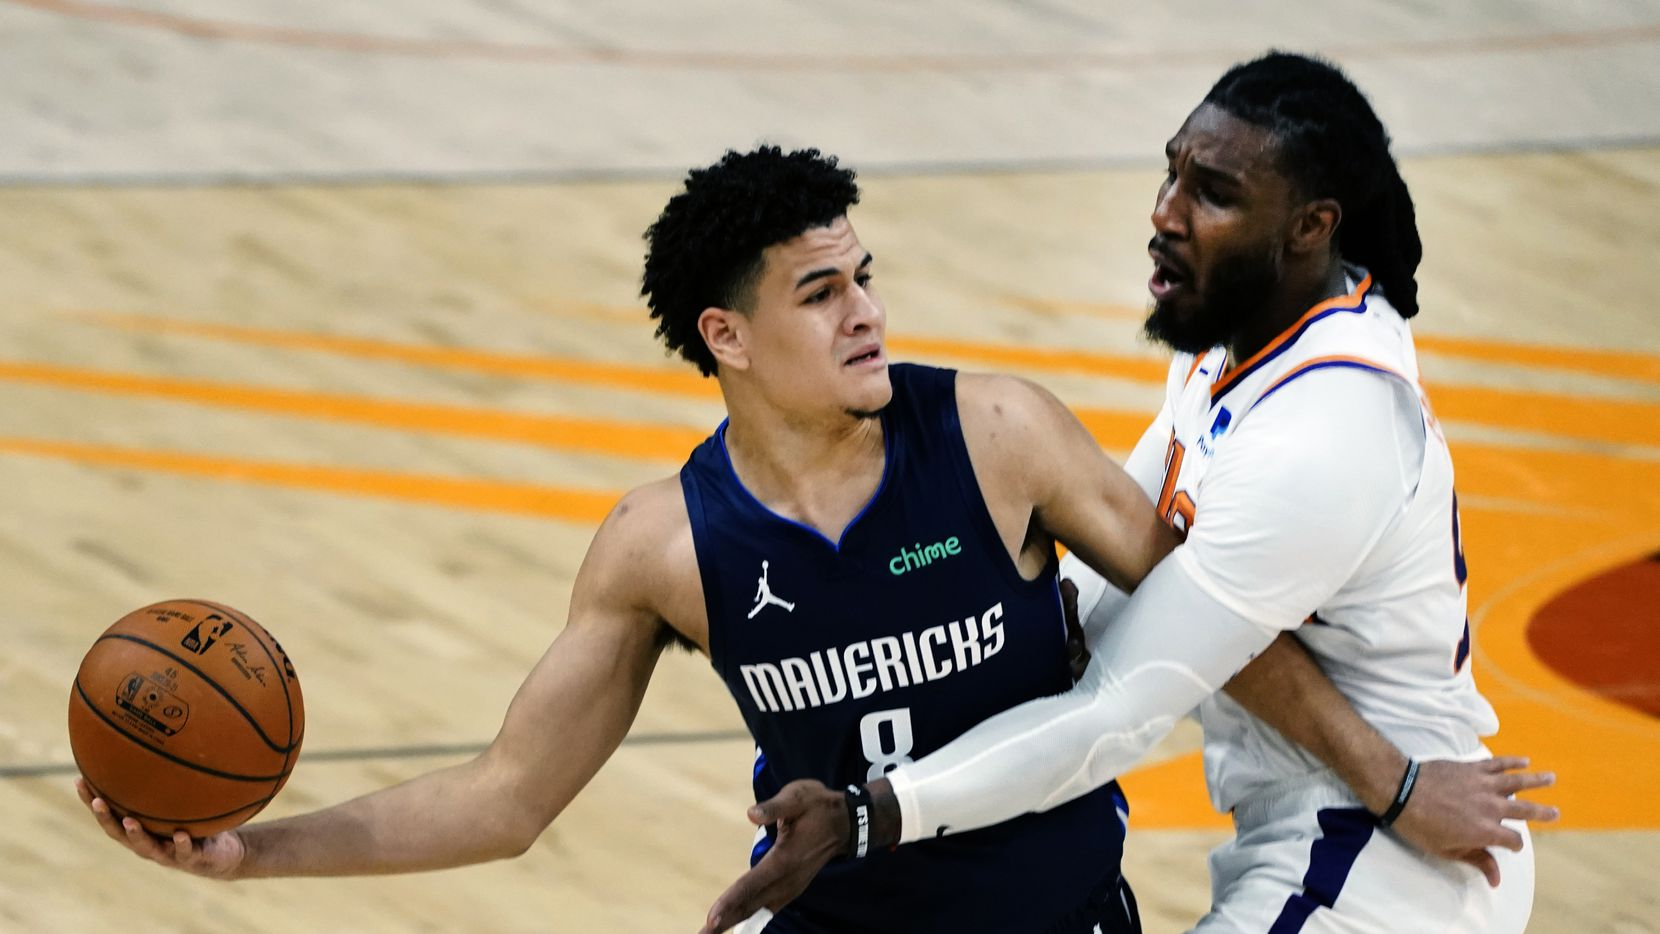 Phoenix Suns forward Jae Crowder pressures Dallas Mavericks guard Josh Green during the first half of an NBA basketball game Wednesday, Dec. 23, 2020, in Phoenix.